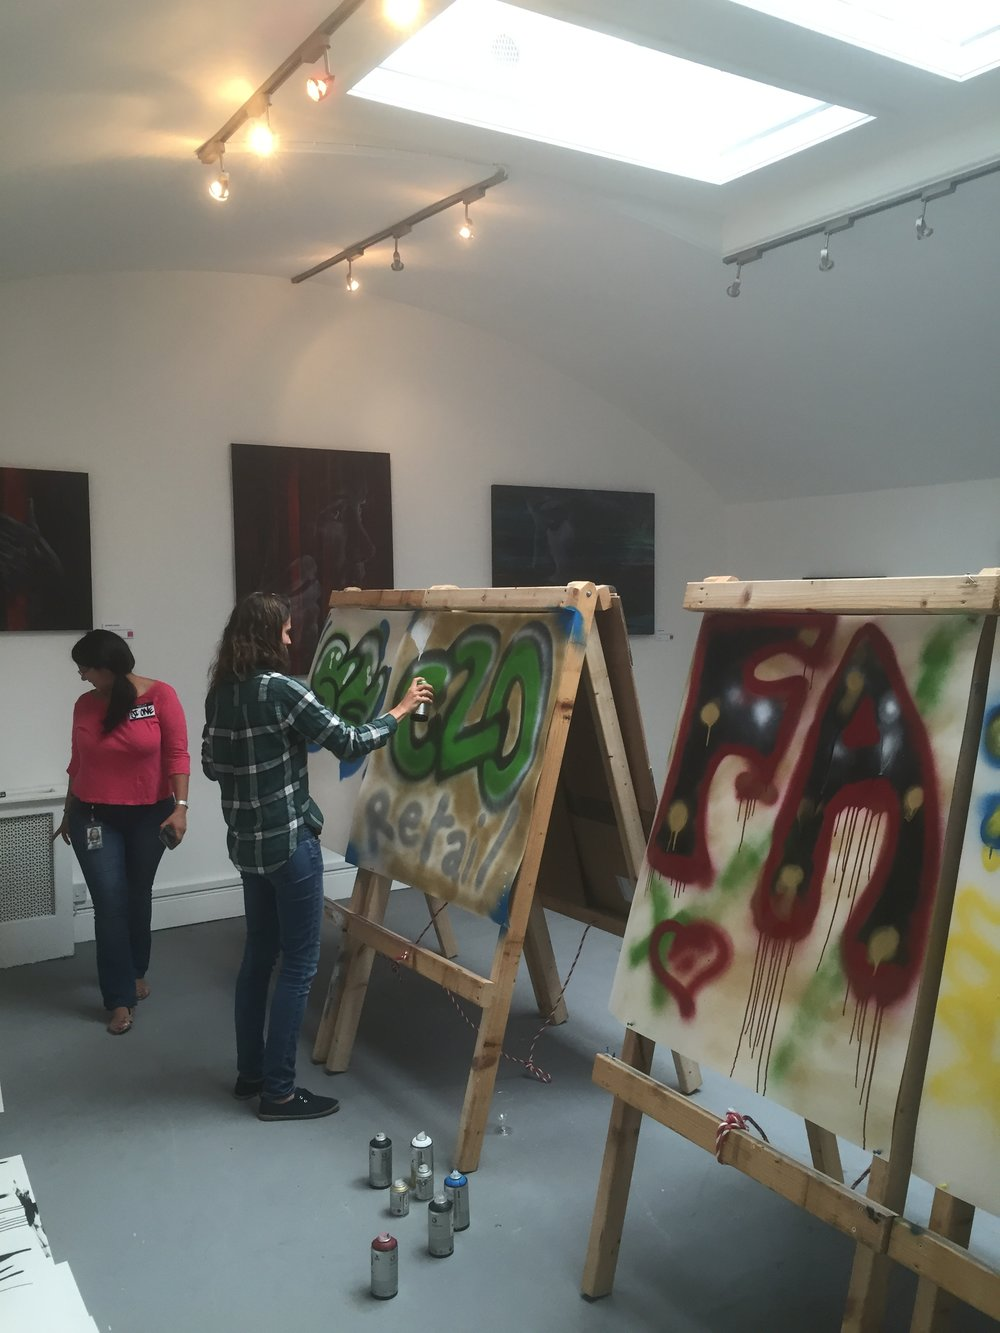 Google-Team-Bulding-Event-The-Kemp-Gallery-Dublin-Ireland-12.JPG